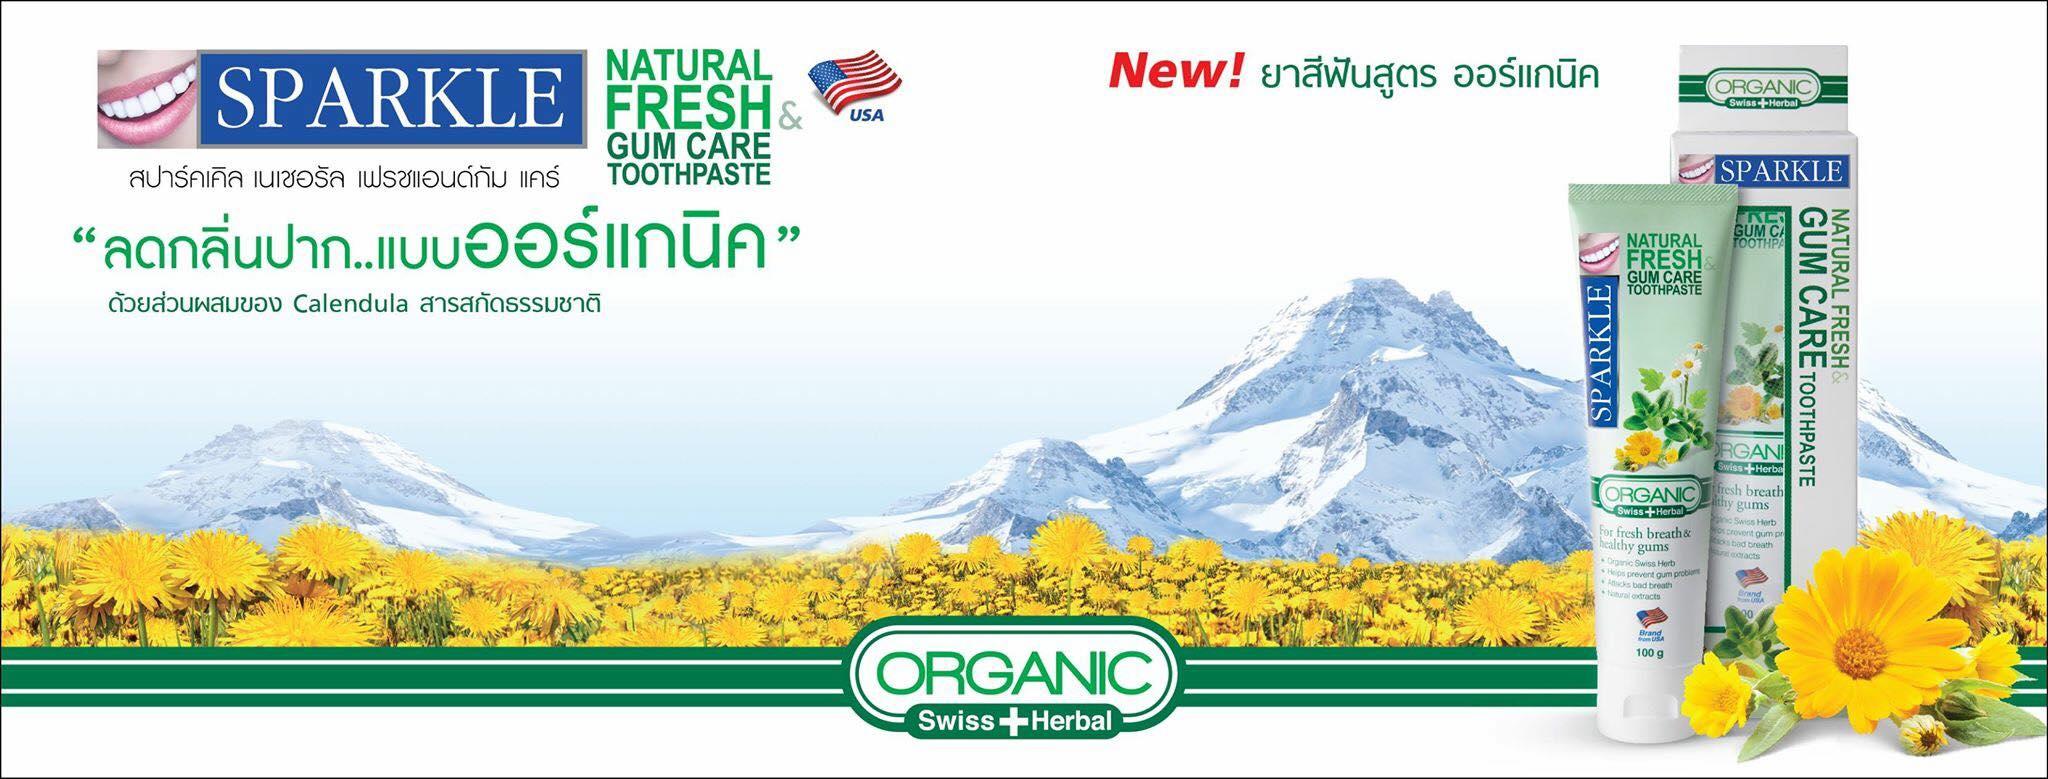 Sparkle Natural Fresh & Gum Care 100 g,ยาสีฟัน Sparkle ,Sparkle Toothpaste,สปาร์คเคิล,Sparkle ซื้อออนไลน์,ยาสีฟันสมุนไพร,ยาสีฟันฟันขาว